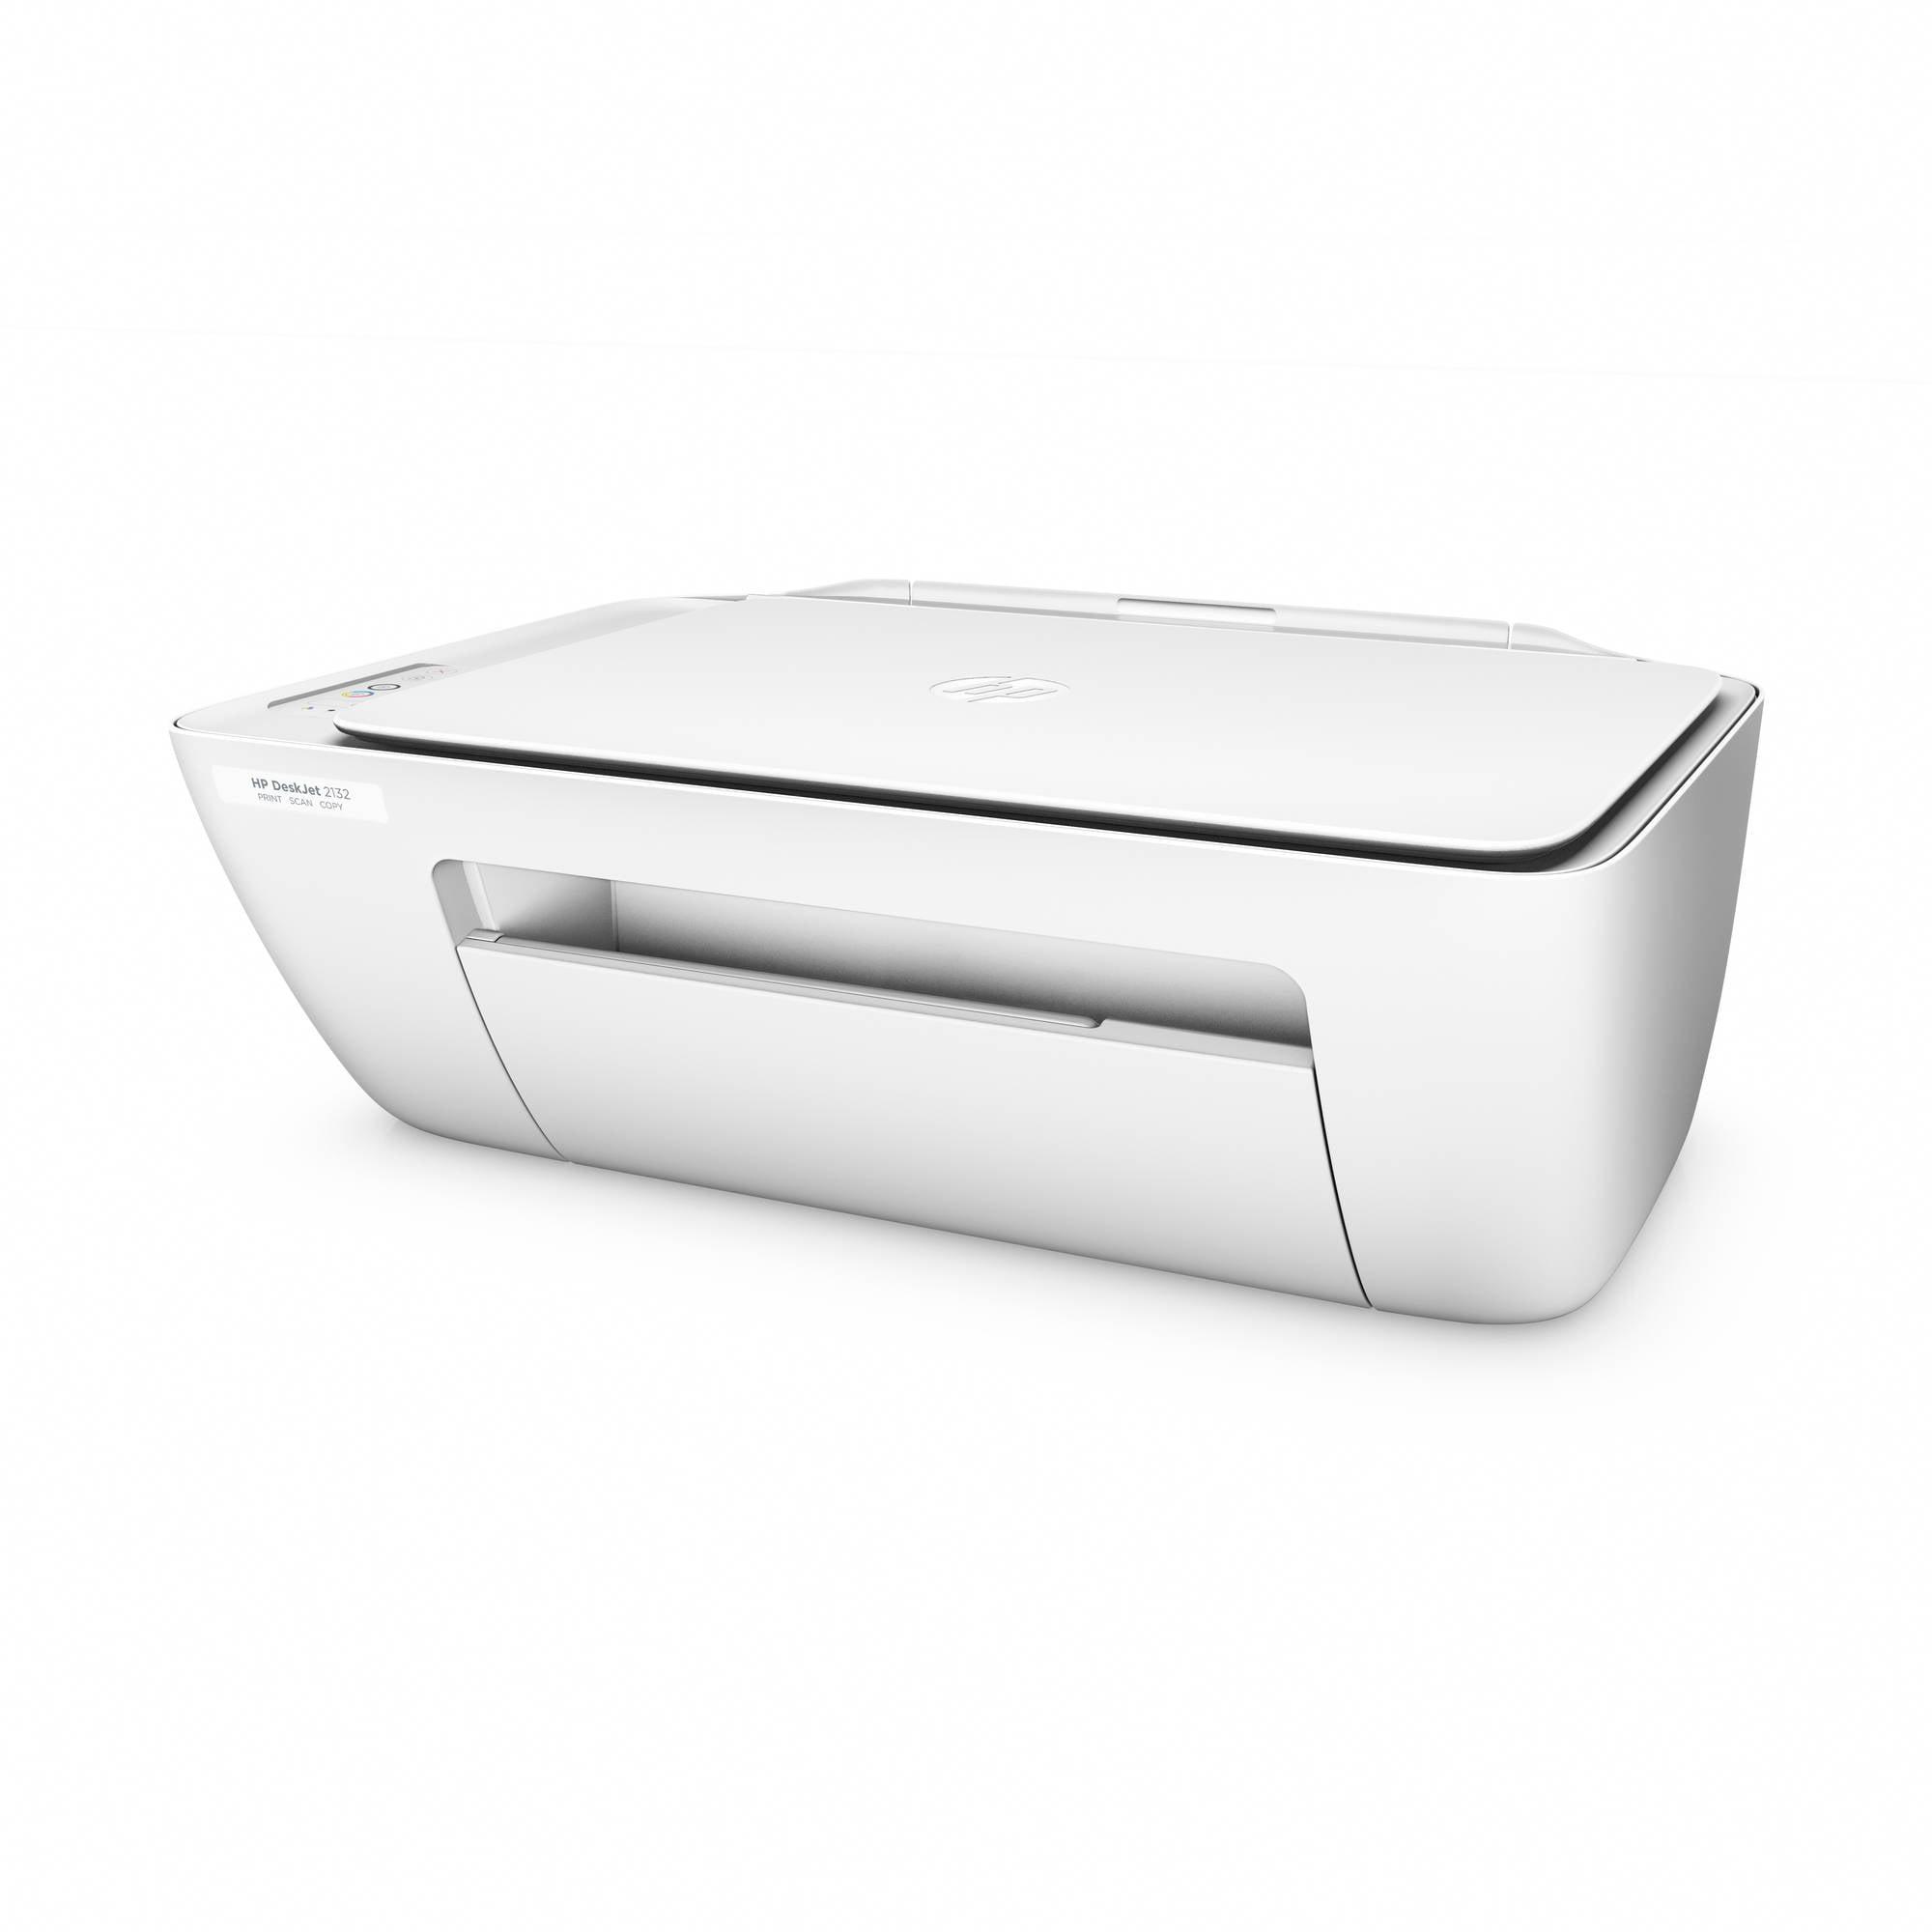 HP Deskjet 2132 All-in-One Printer/Copier/Scanner - Walmart.com